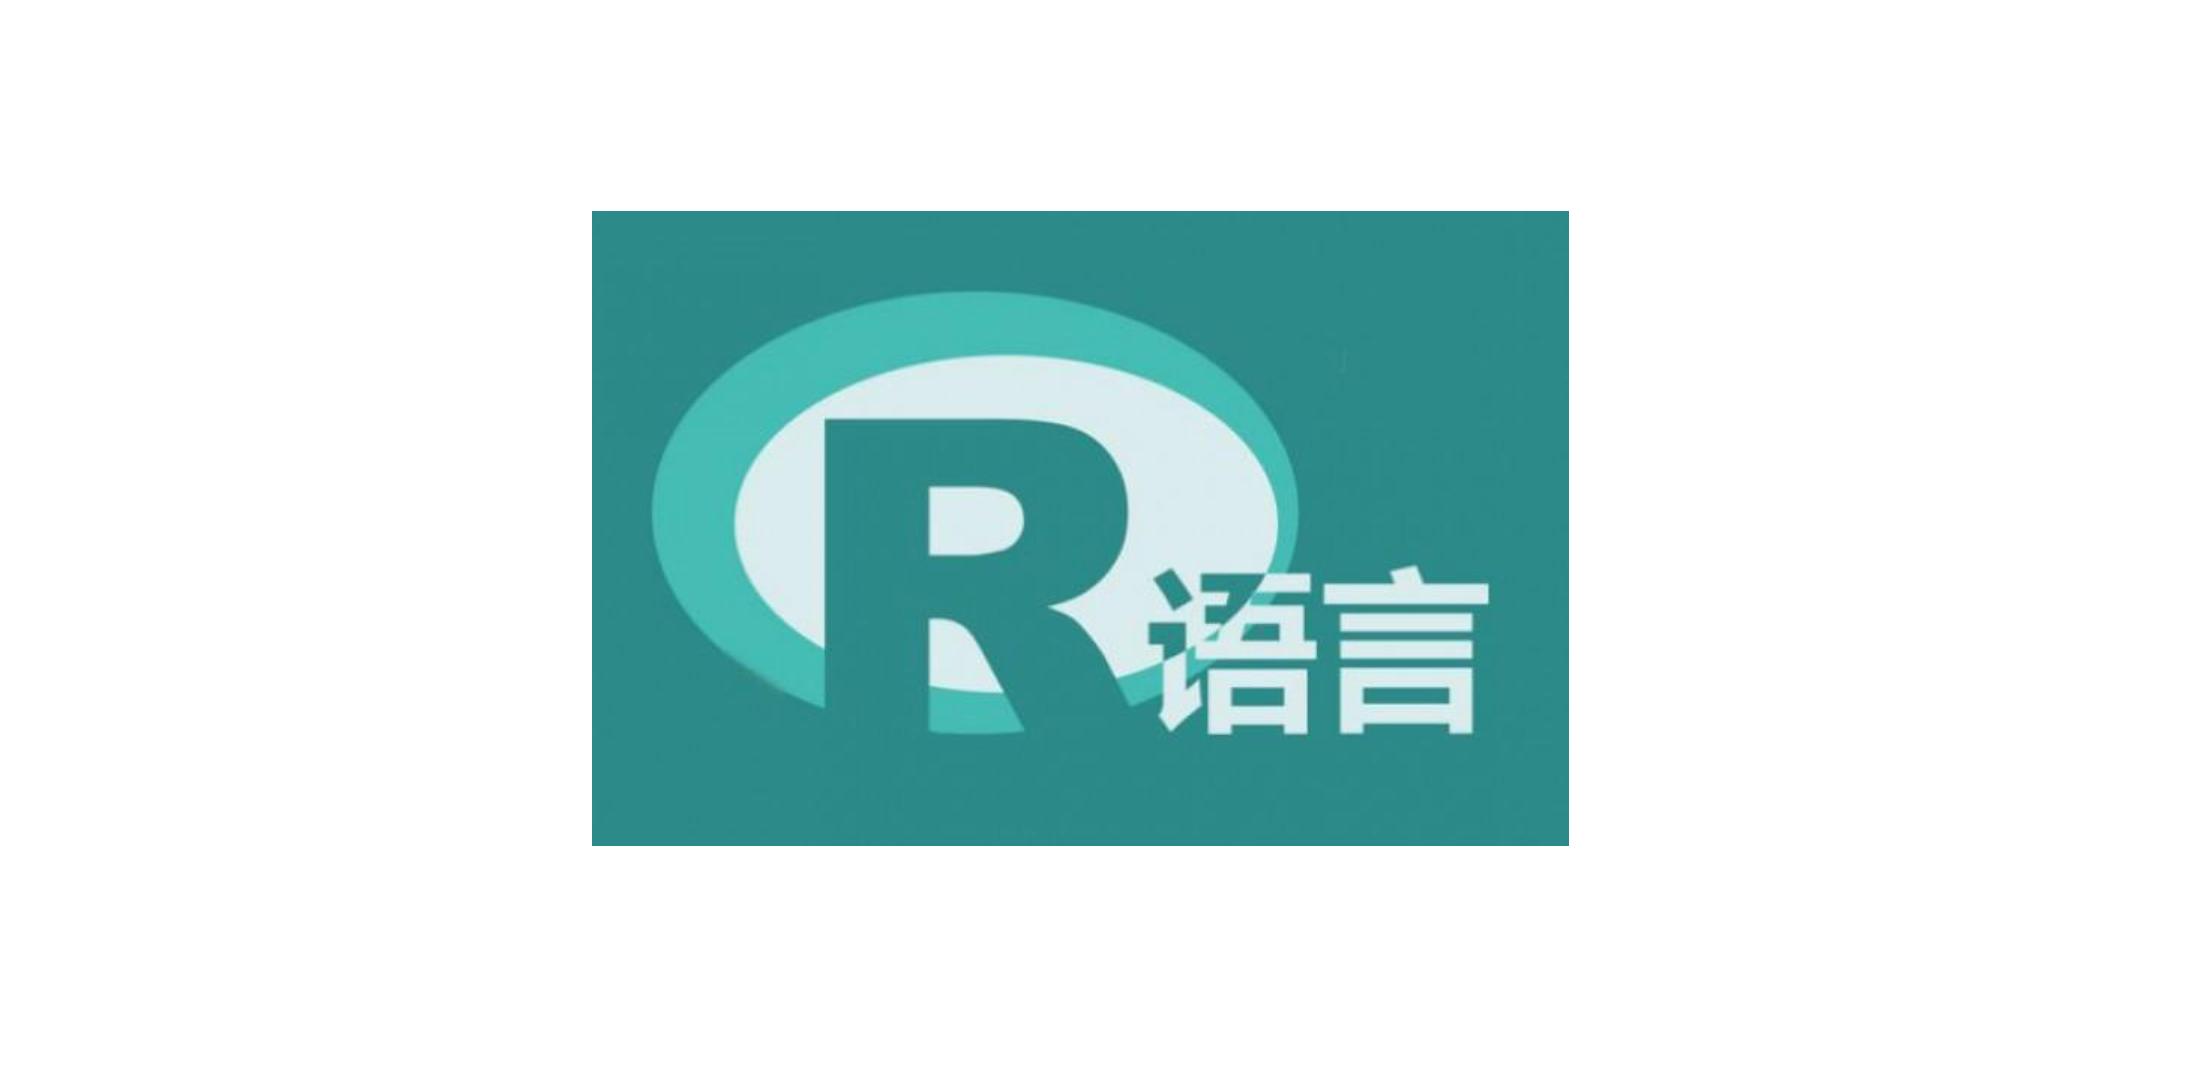 R语言操作基础